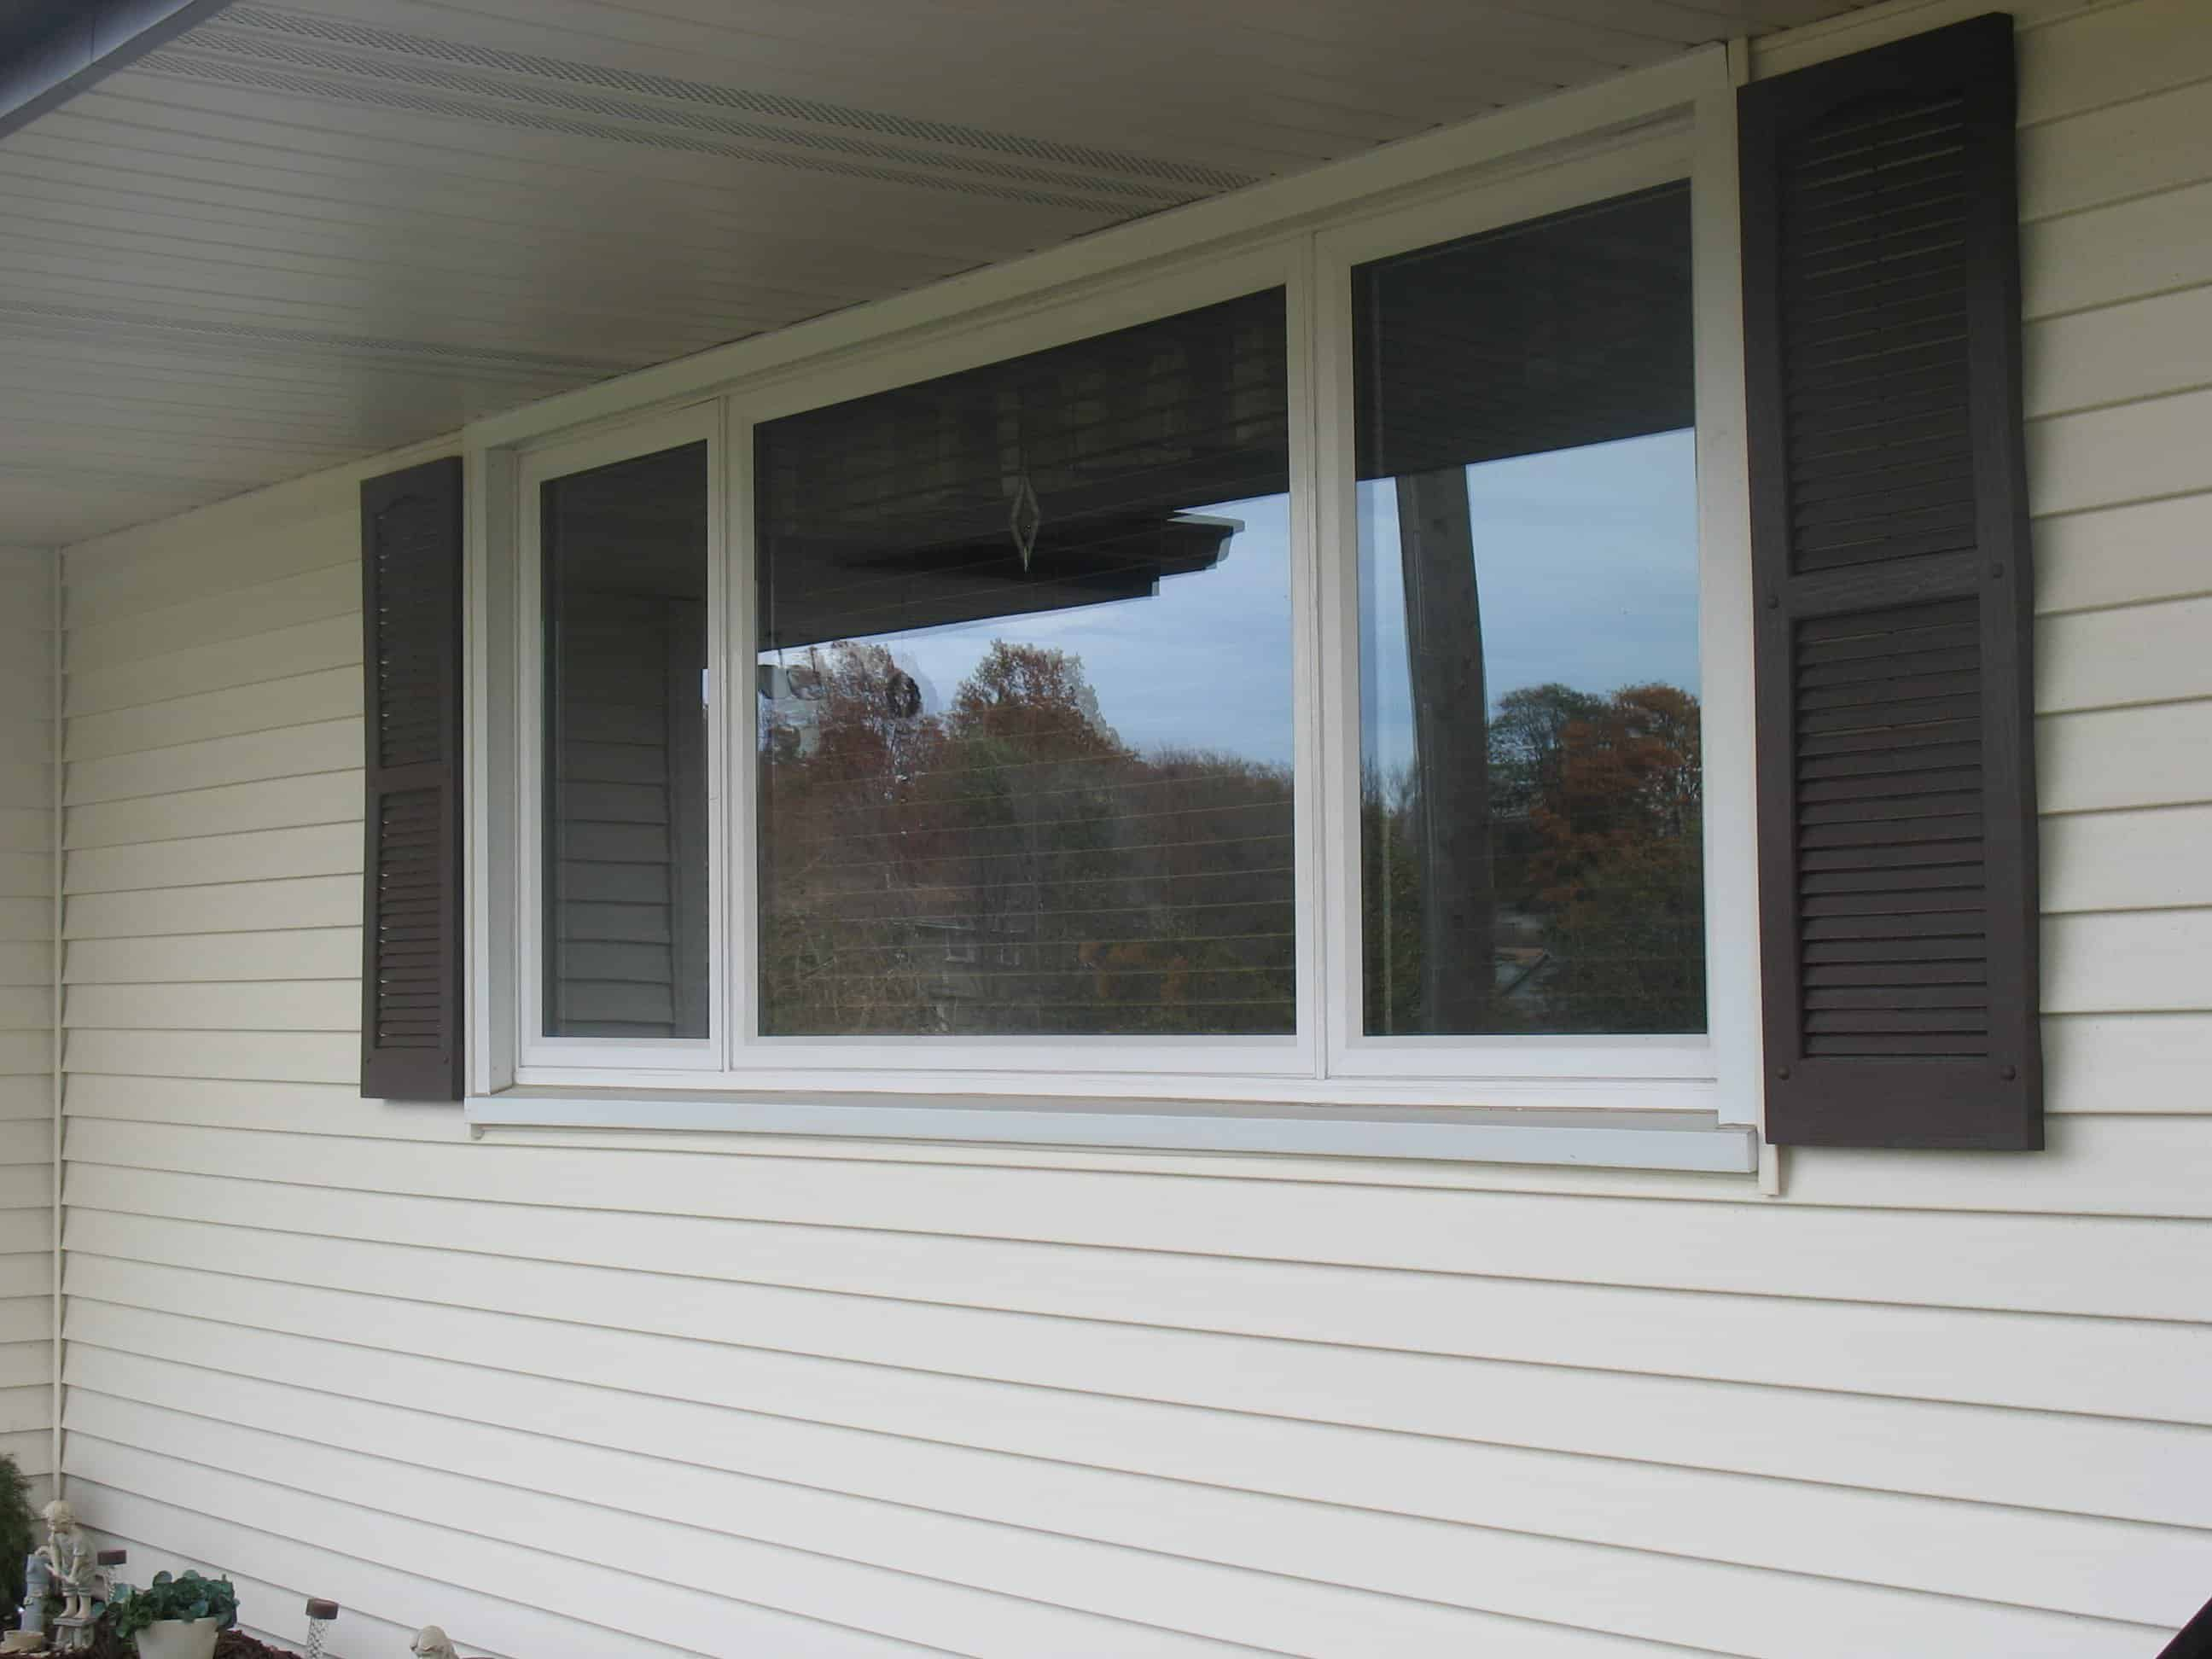 Revere Vinyl Casement Windows And More Associated Siding